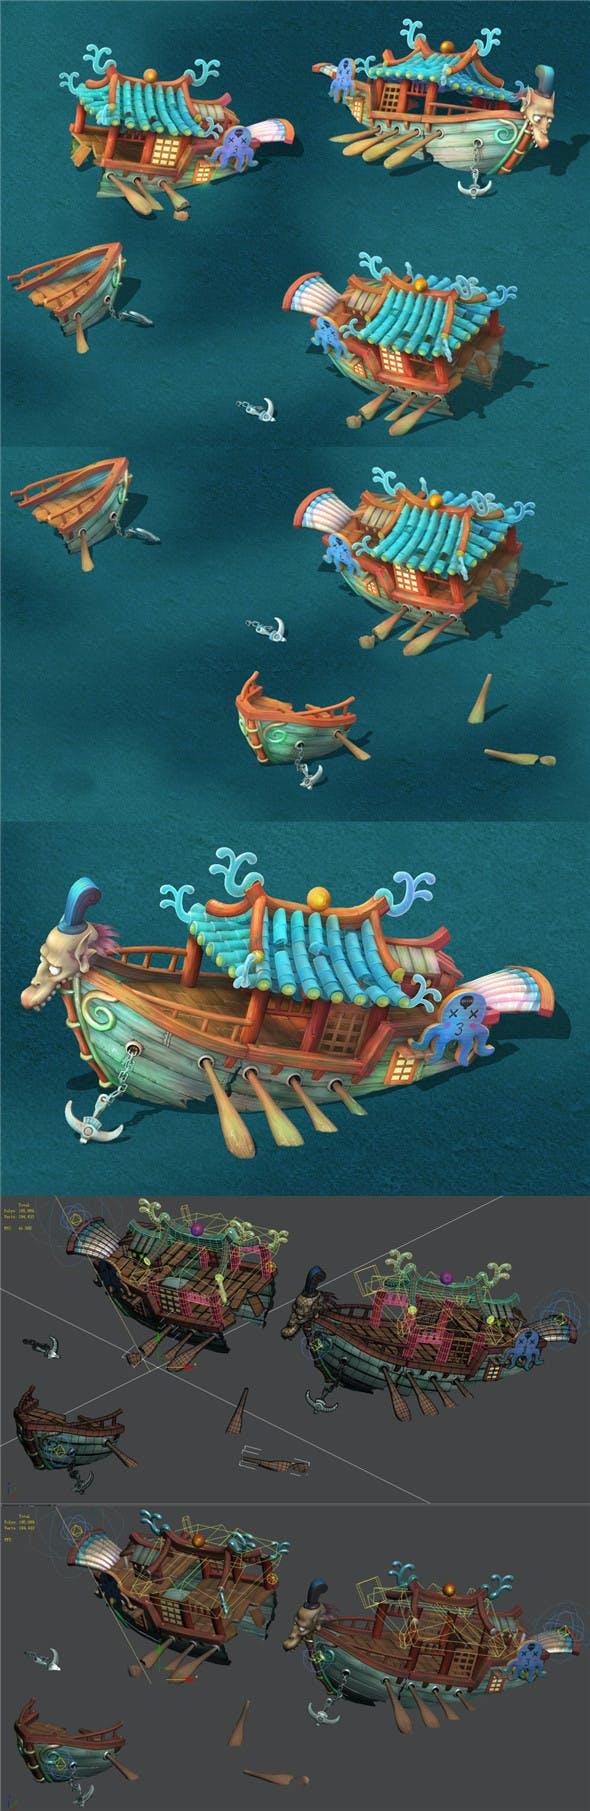 Submarine Cartoon World - Princess Shipwreck - 3DOcean Item for Sale